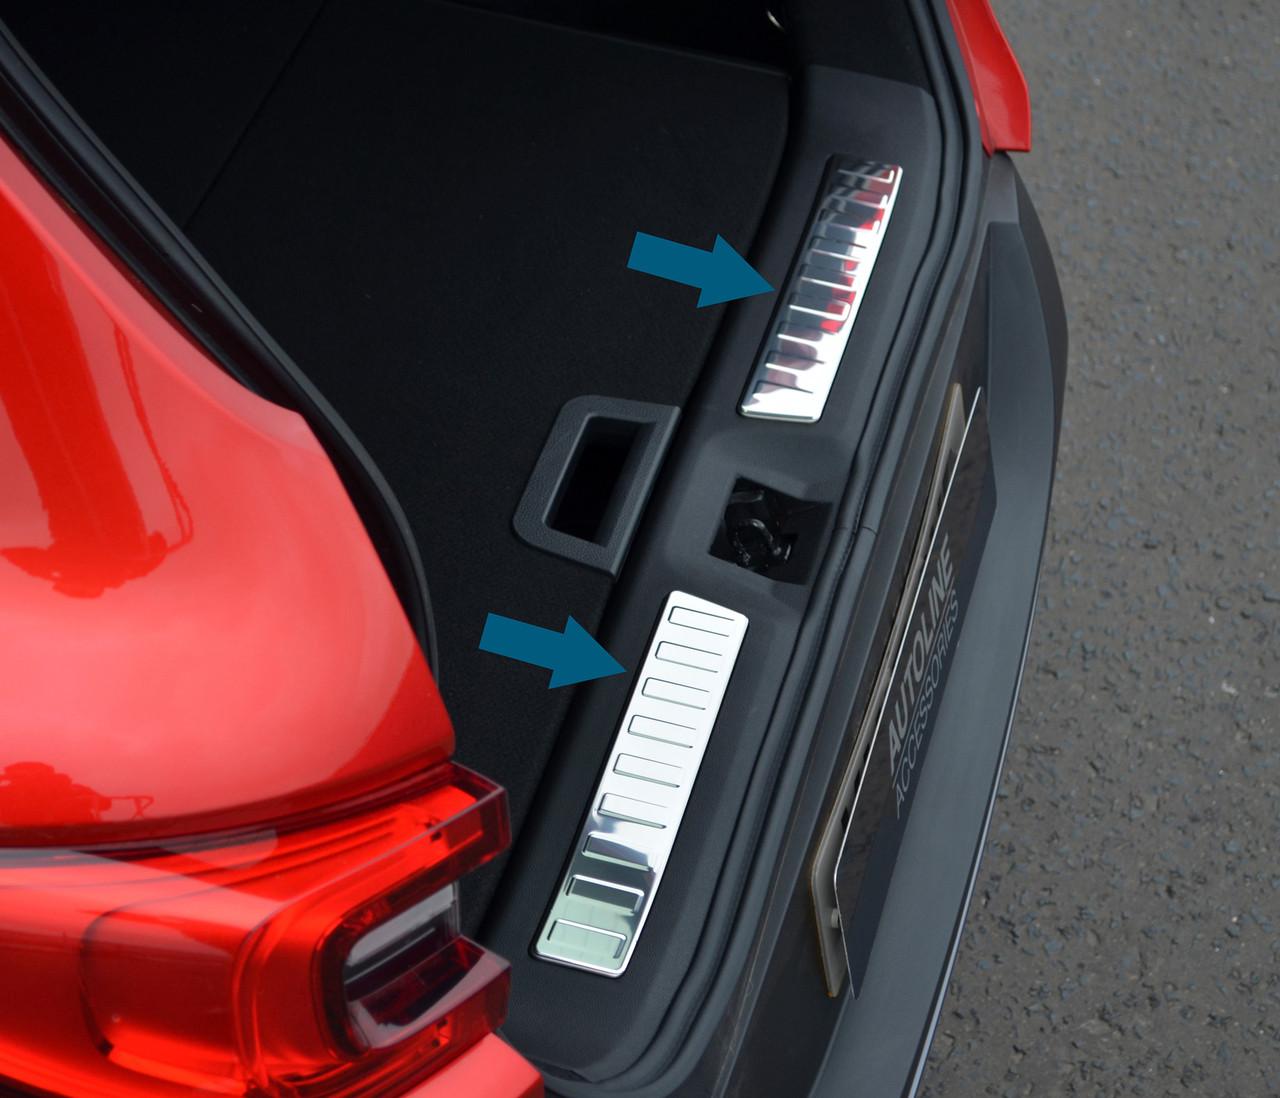 Mercedes Benz W169 A-Class Rear Bumper Protector Guard Trim Cover Chrome Sill